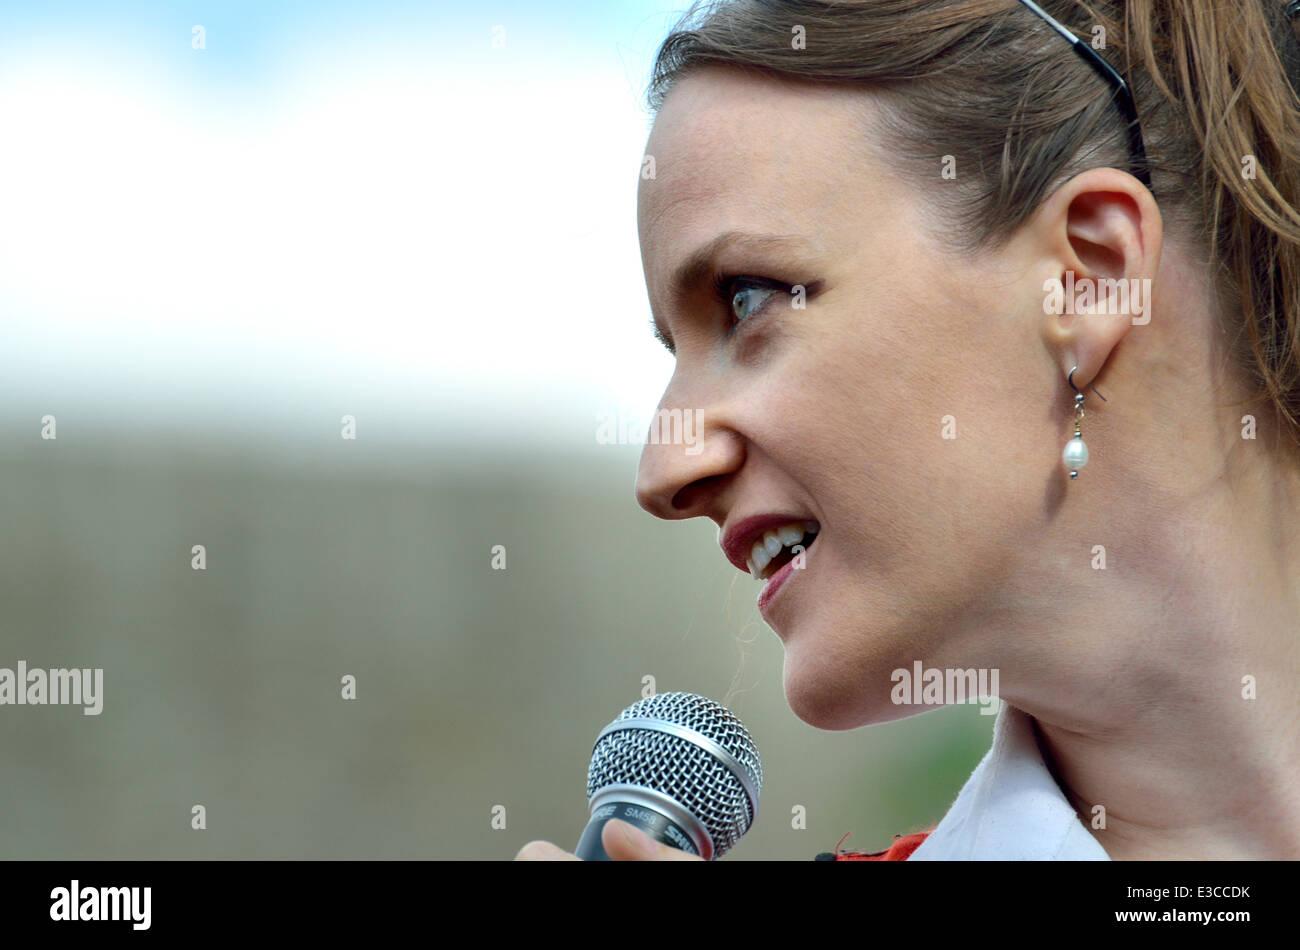 Kate Smurthwaite speaking in Parliament Square, London, 21st June 2014 - Stock Image